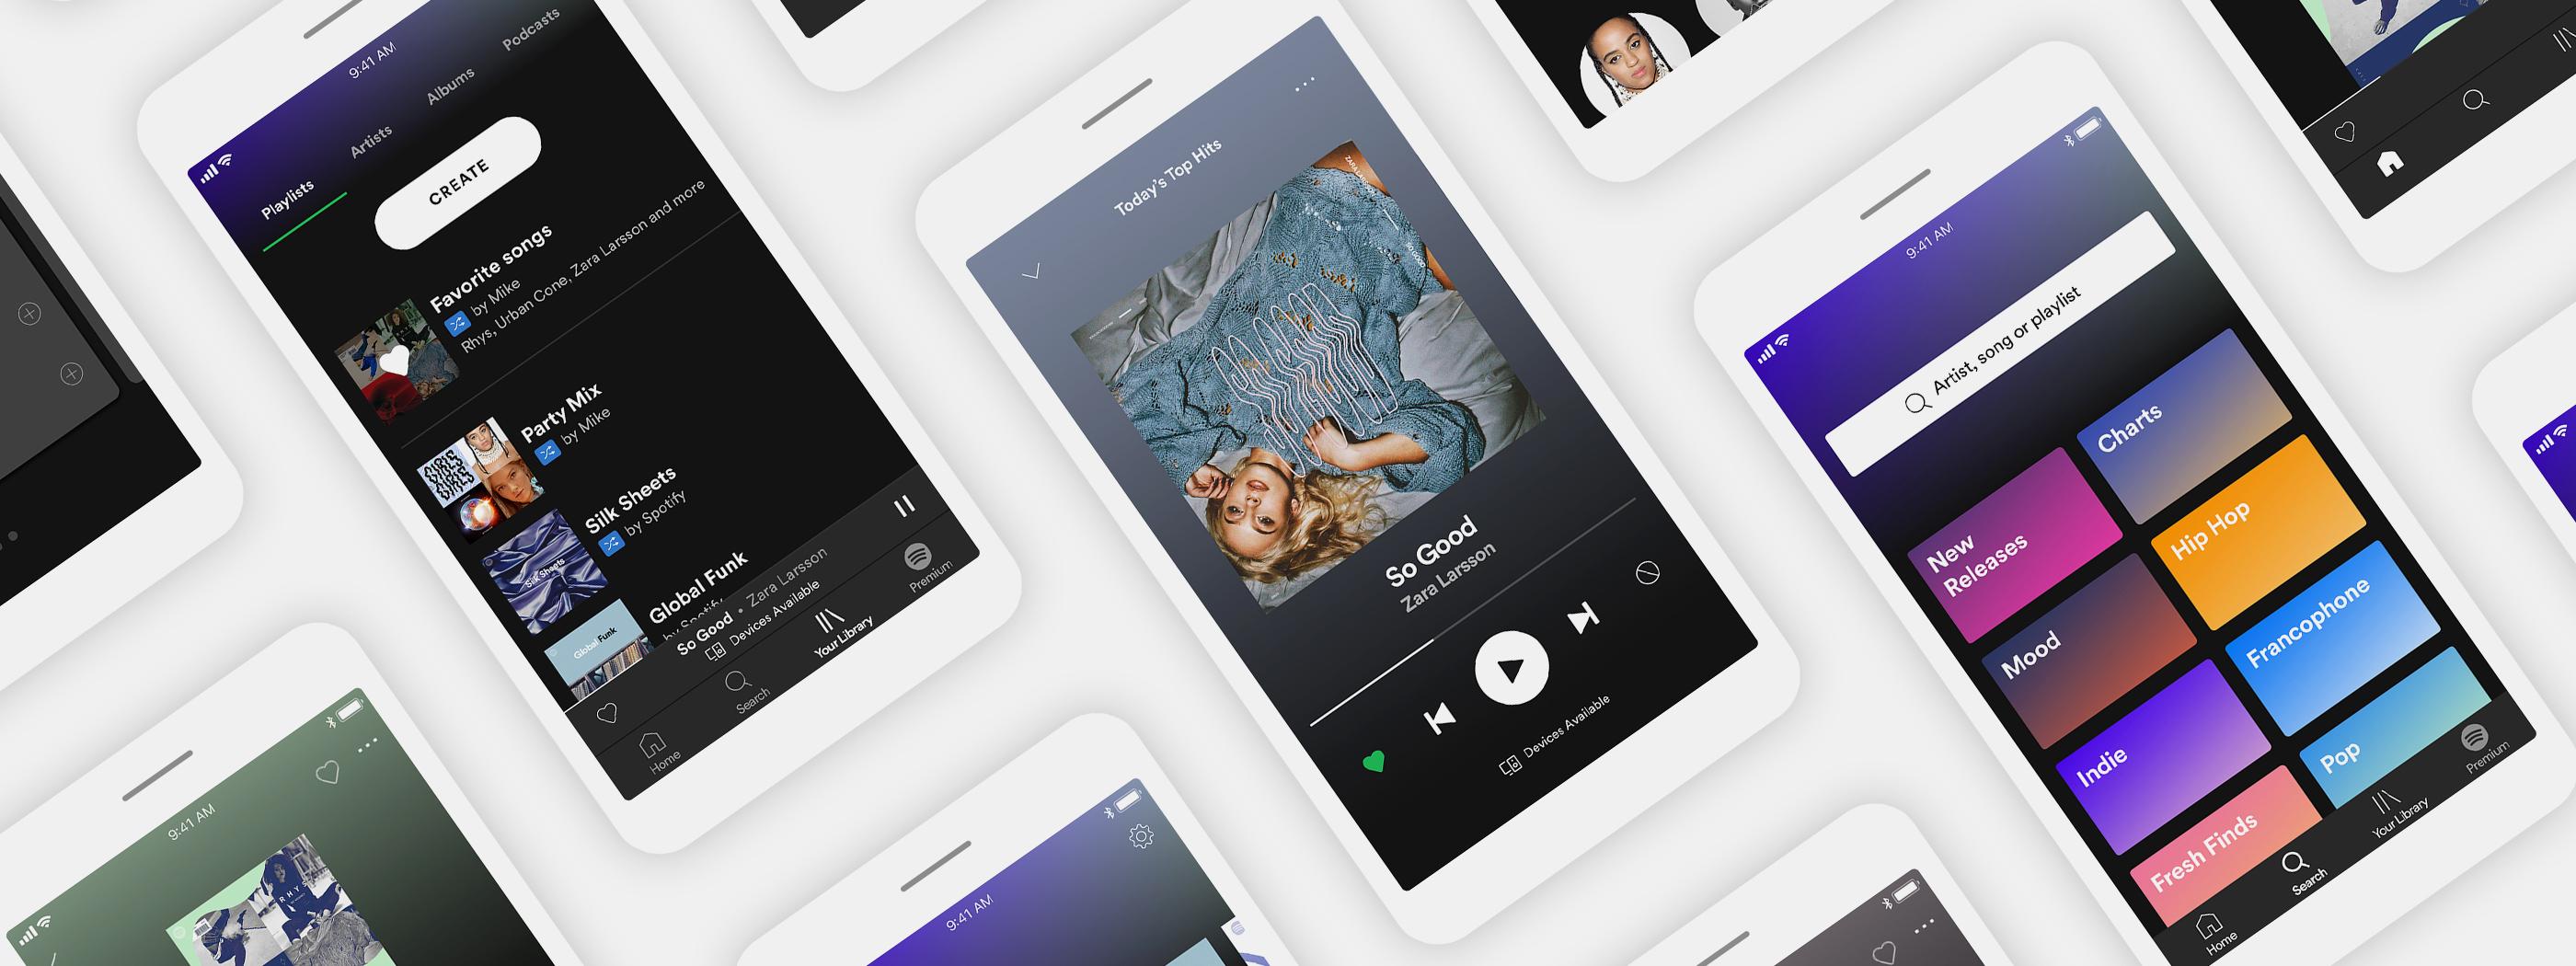 Spotify schaltet Subscriptions frei